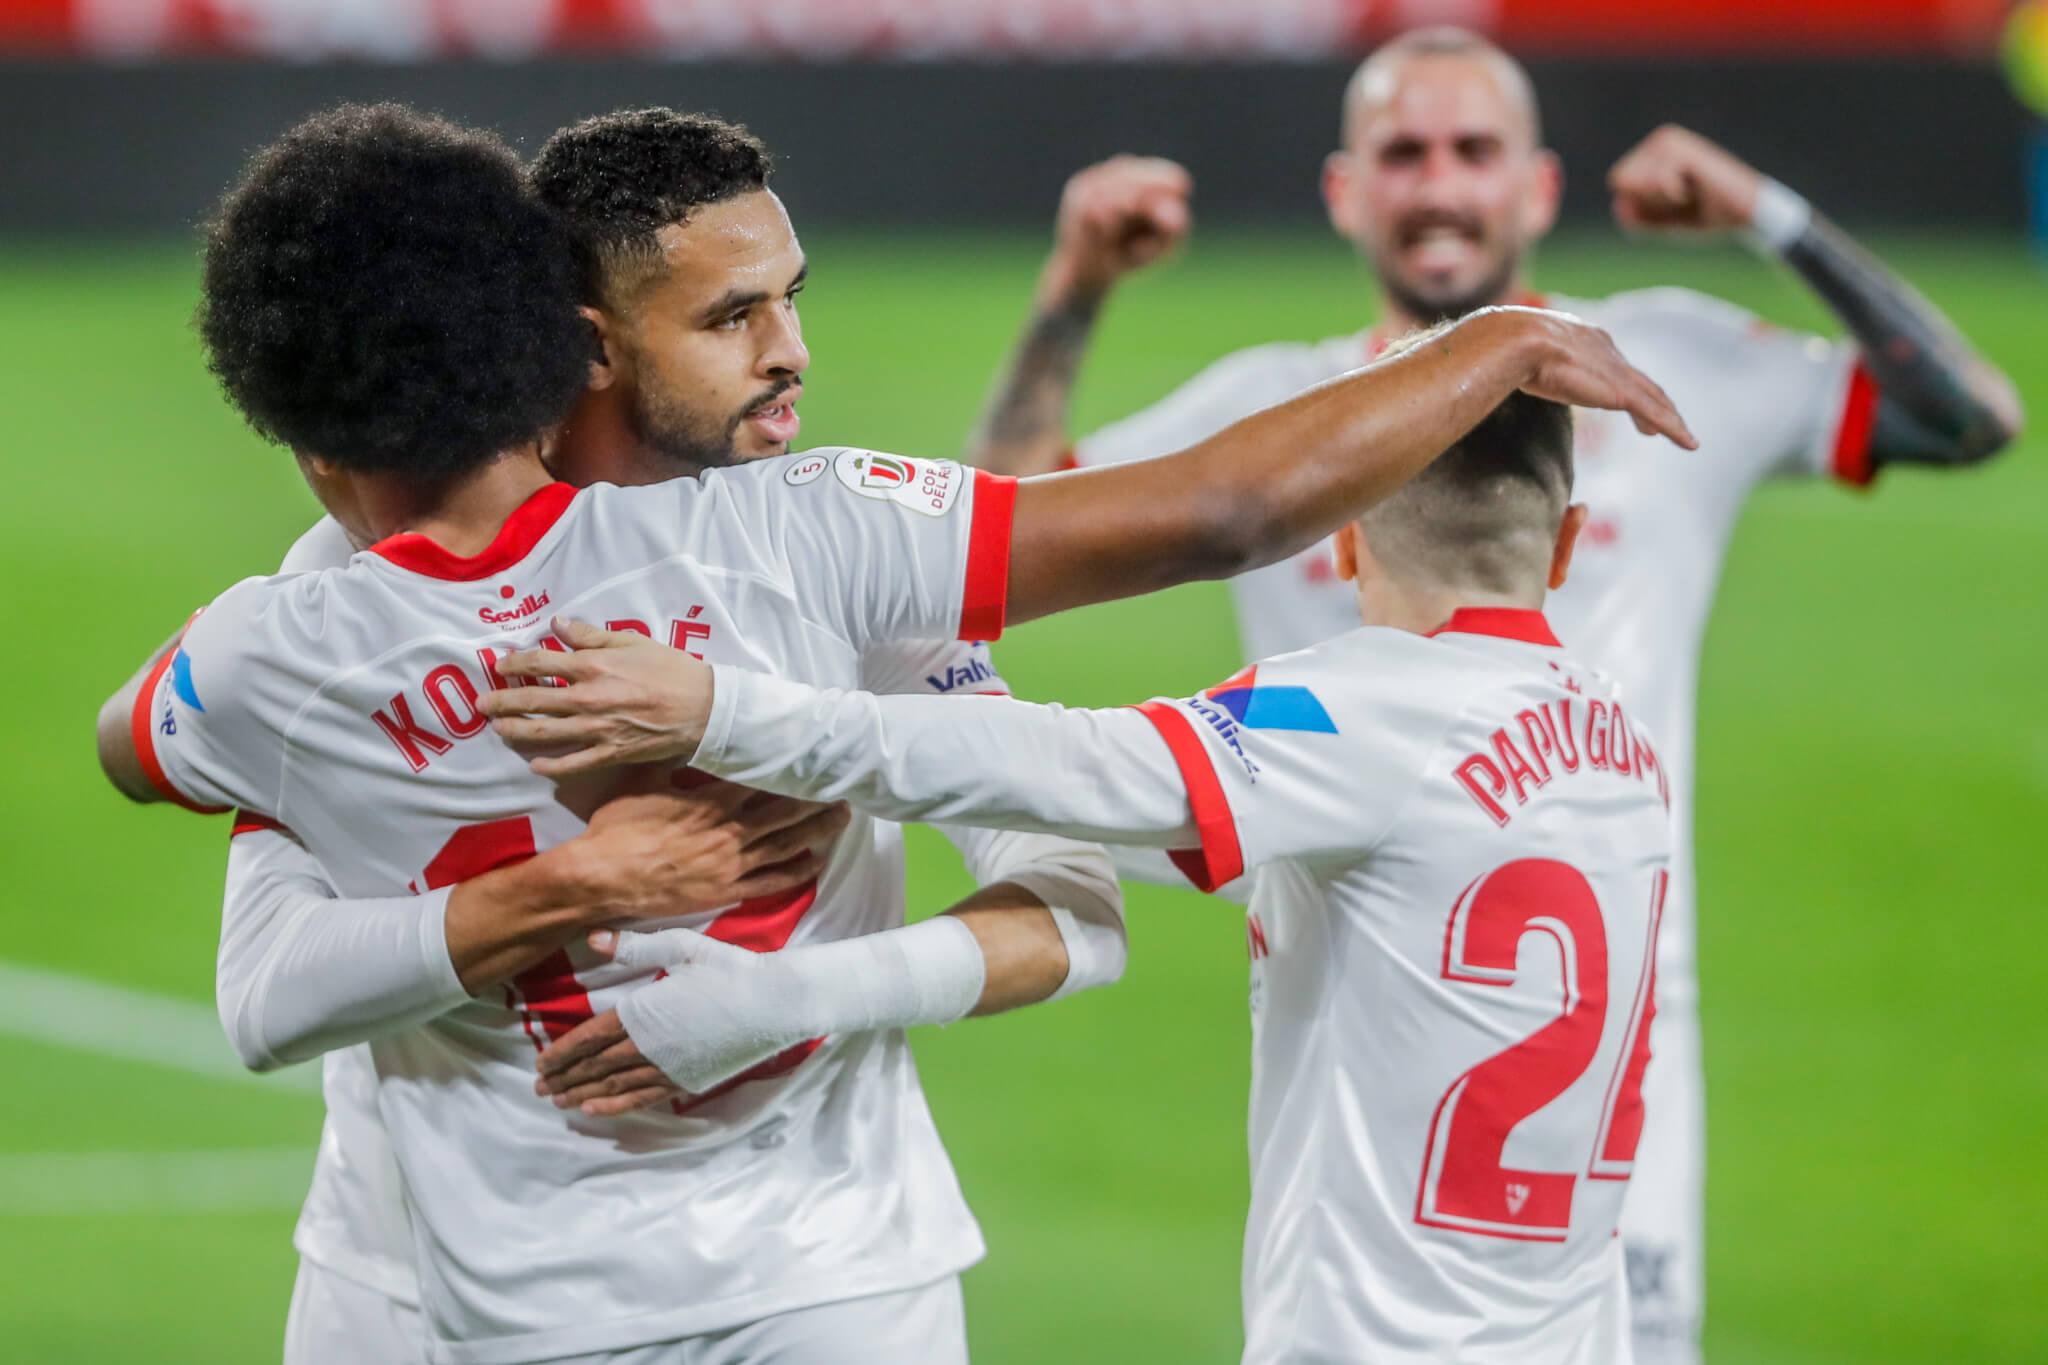 Sevilla Vs Borussia Dortmund Odds Prediction Champions League Round Of 16 Leg 1